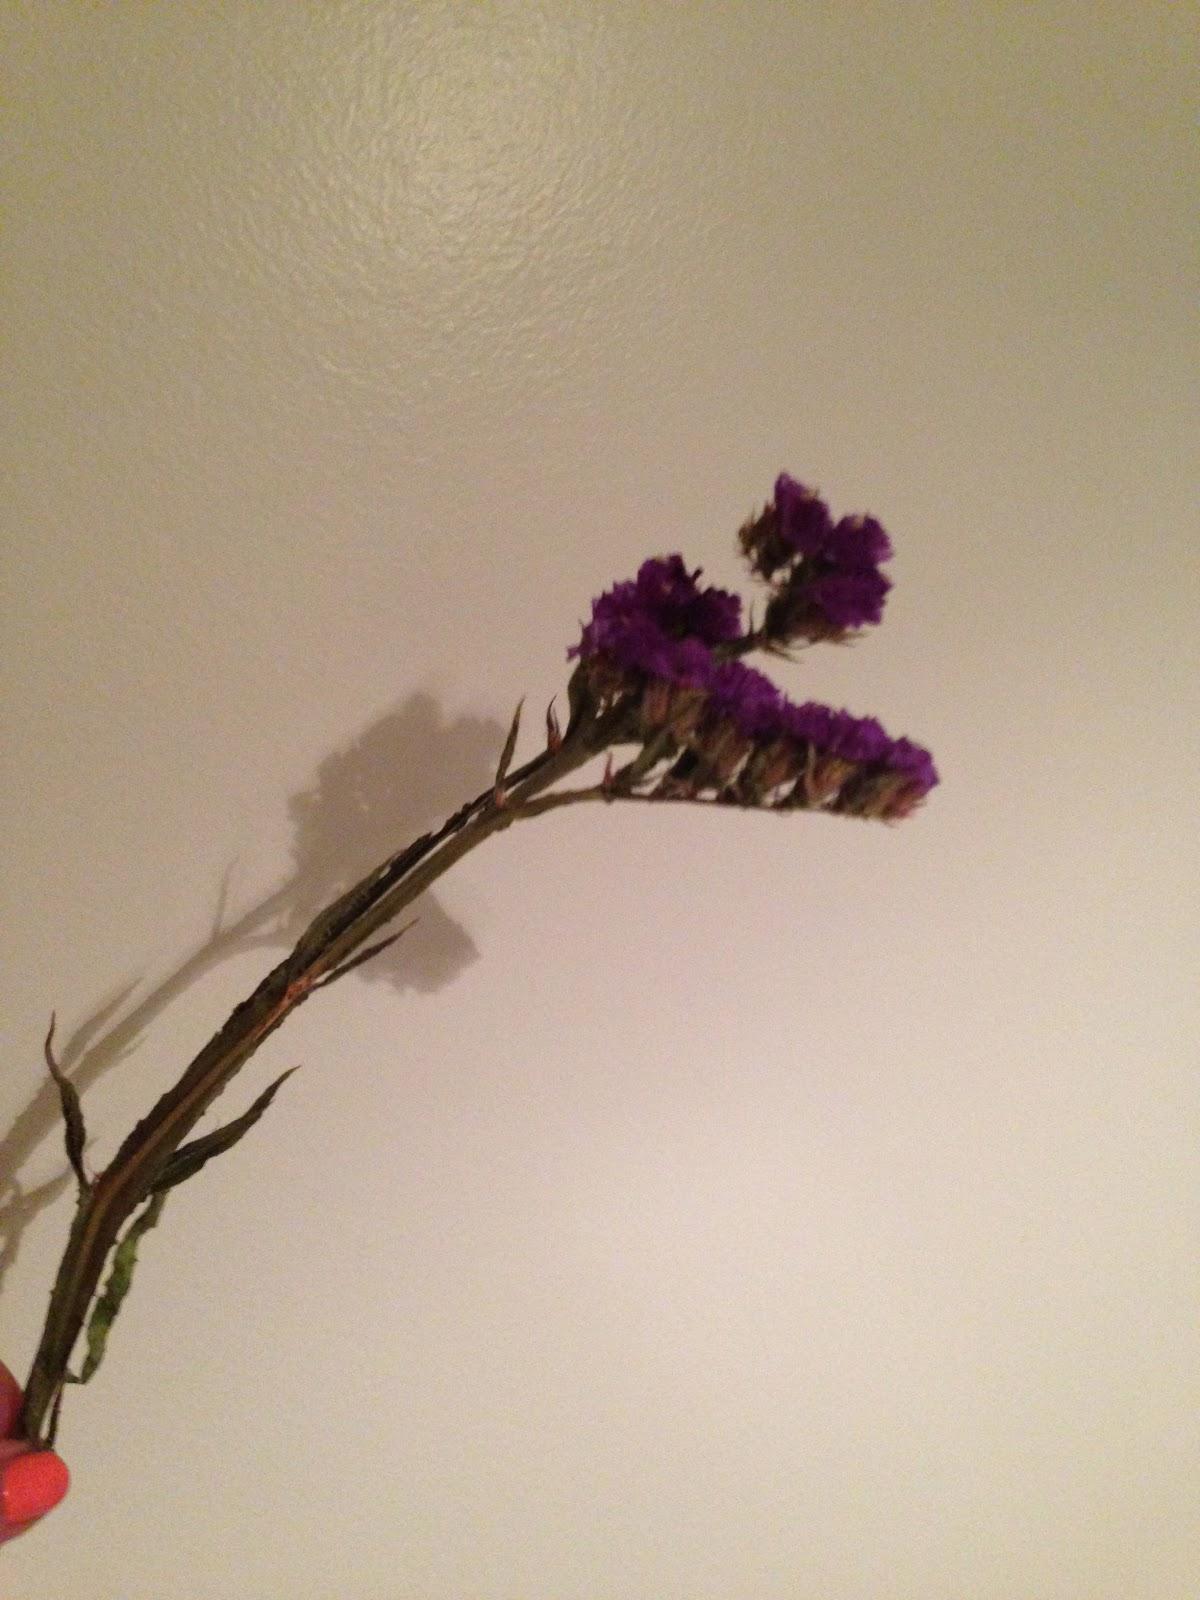 LA MECCA: DIY: Make flowers last forever